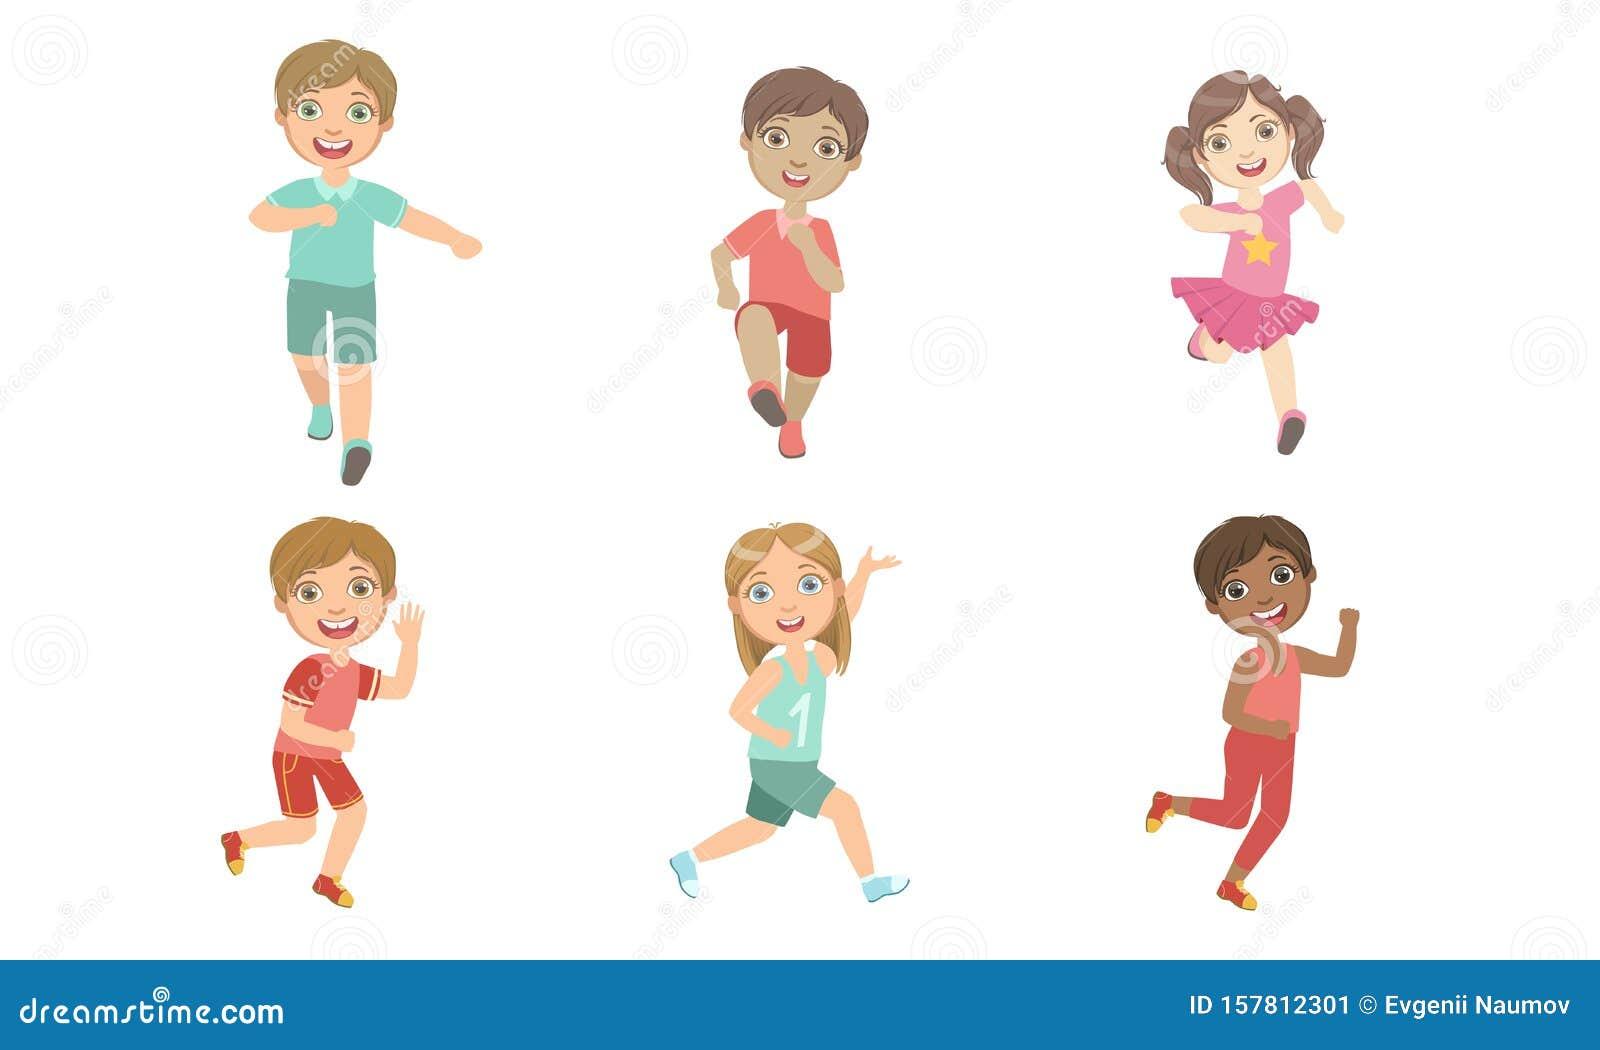 Fast clipart kid marathon, Fast kid marathon Transparent FREE for download  on WebStockReview 2020